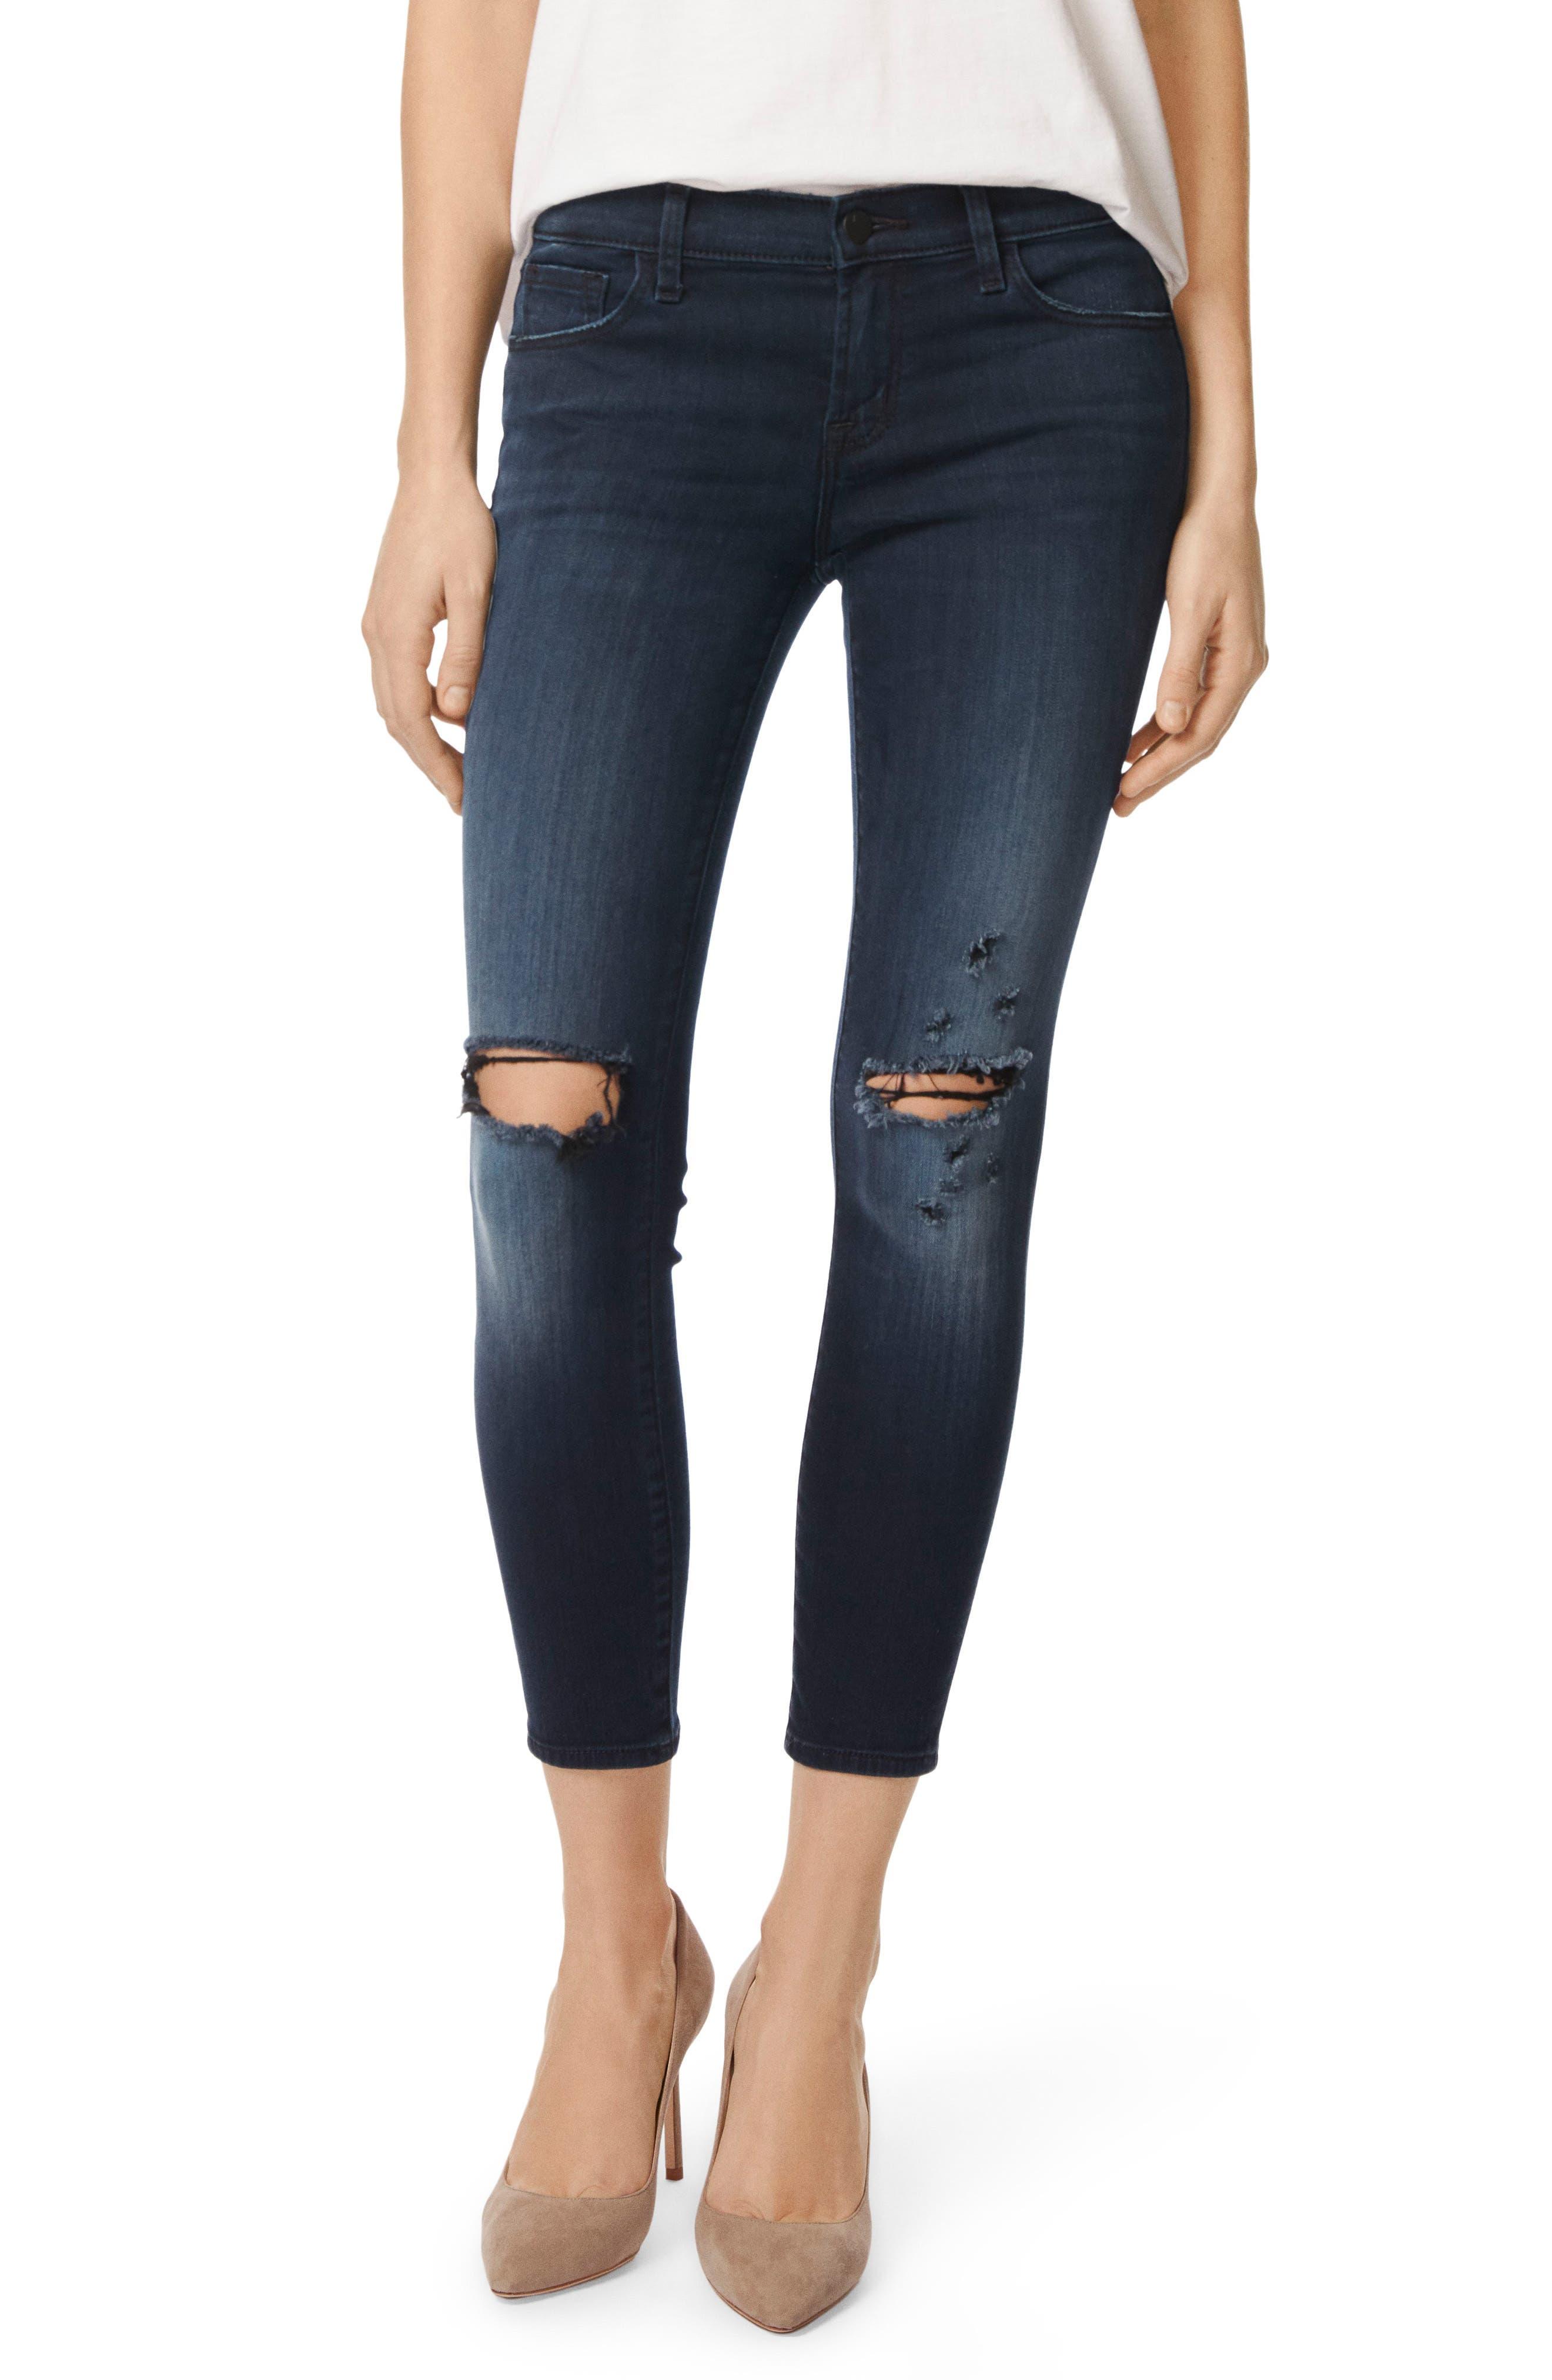 9326 Low Rise Crop Skinny Jeans,                             Main thumbnail 1, color,                             Black Sea